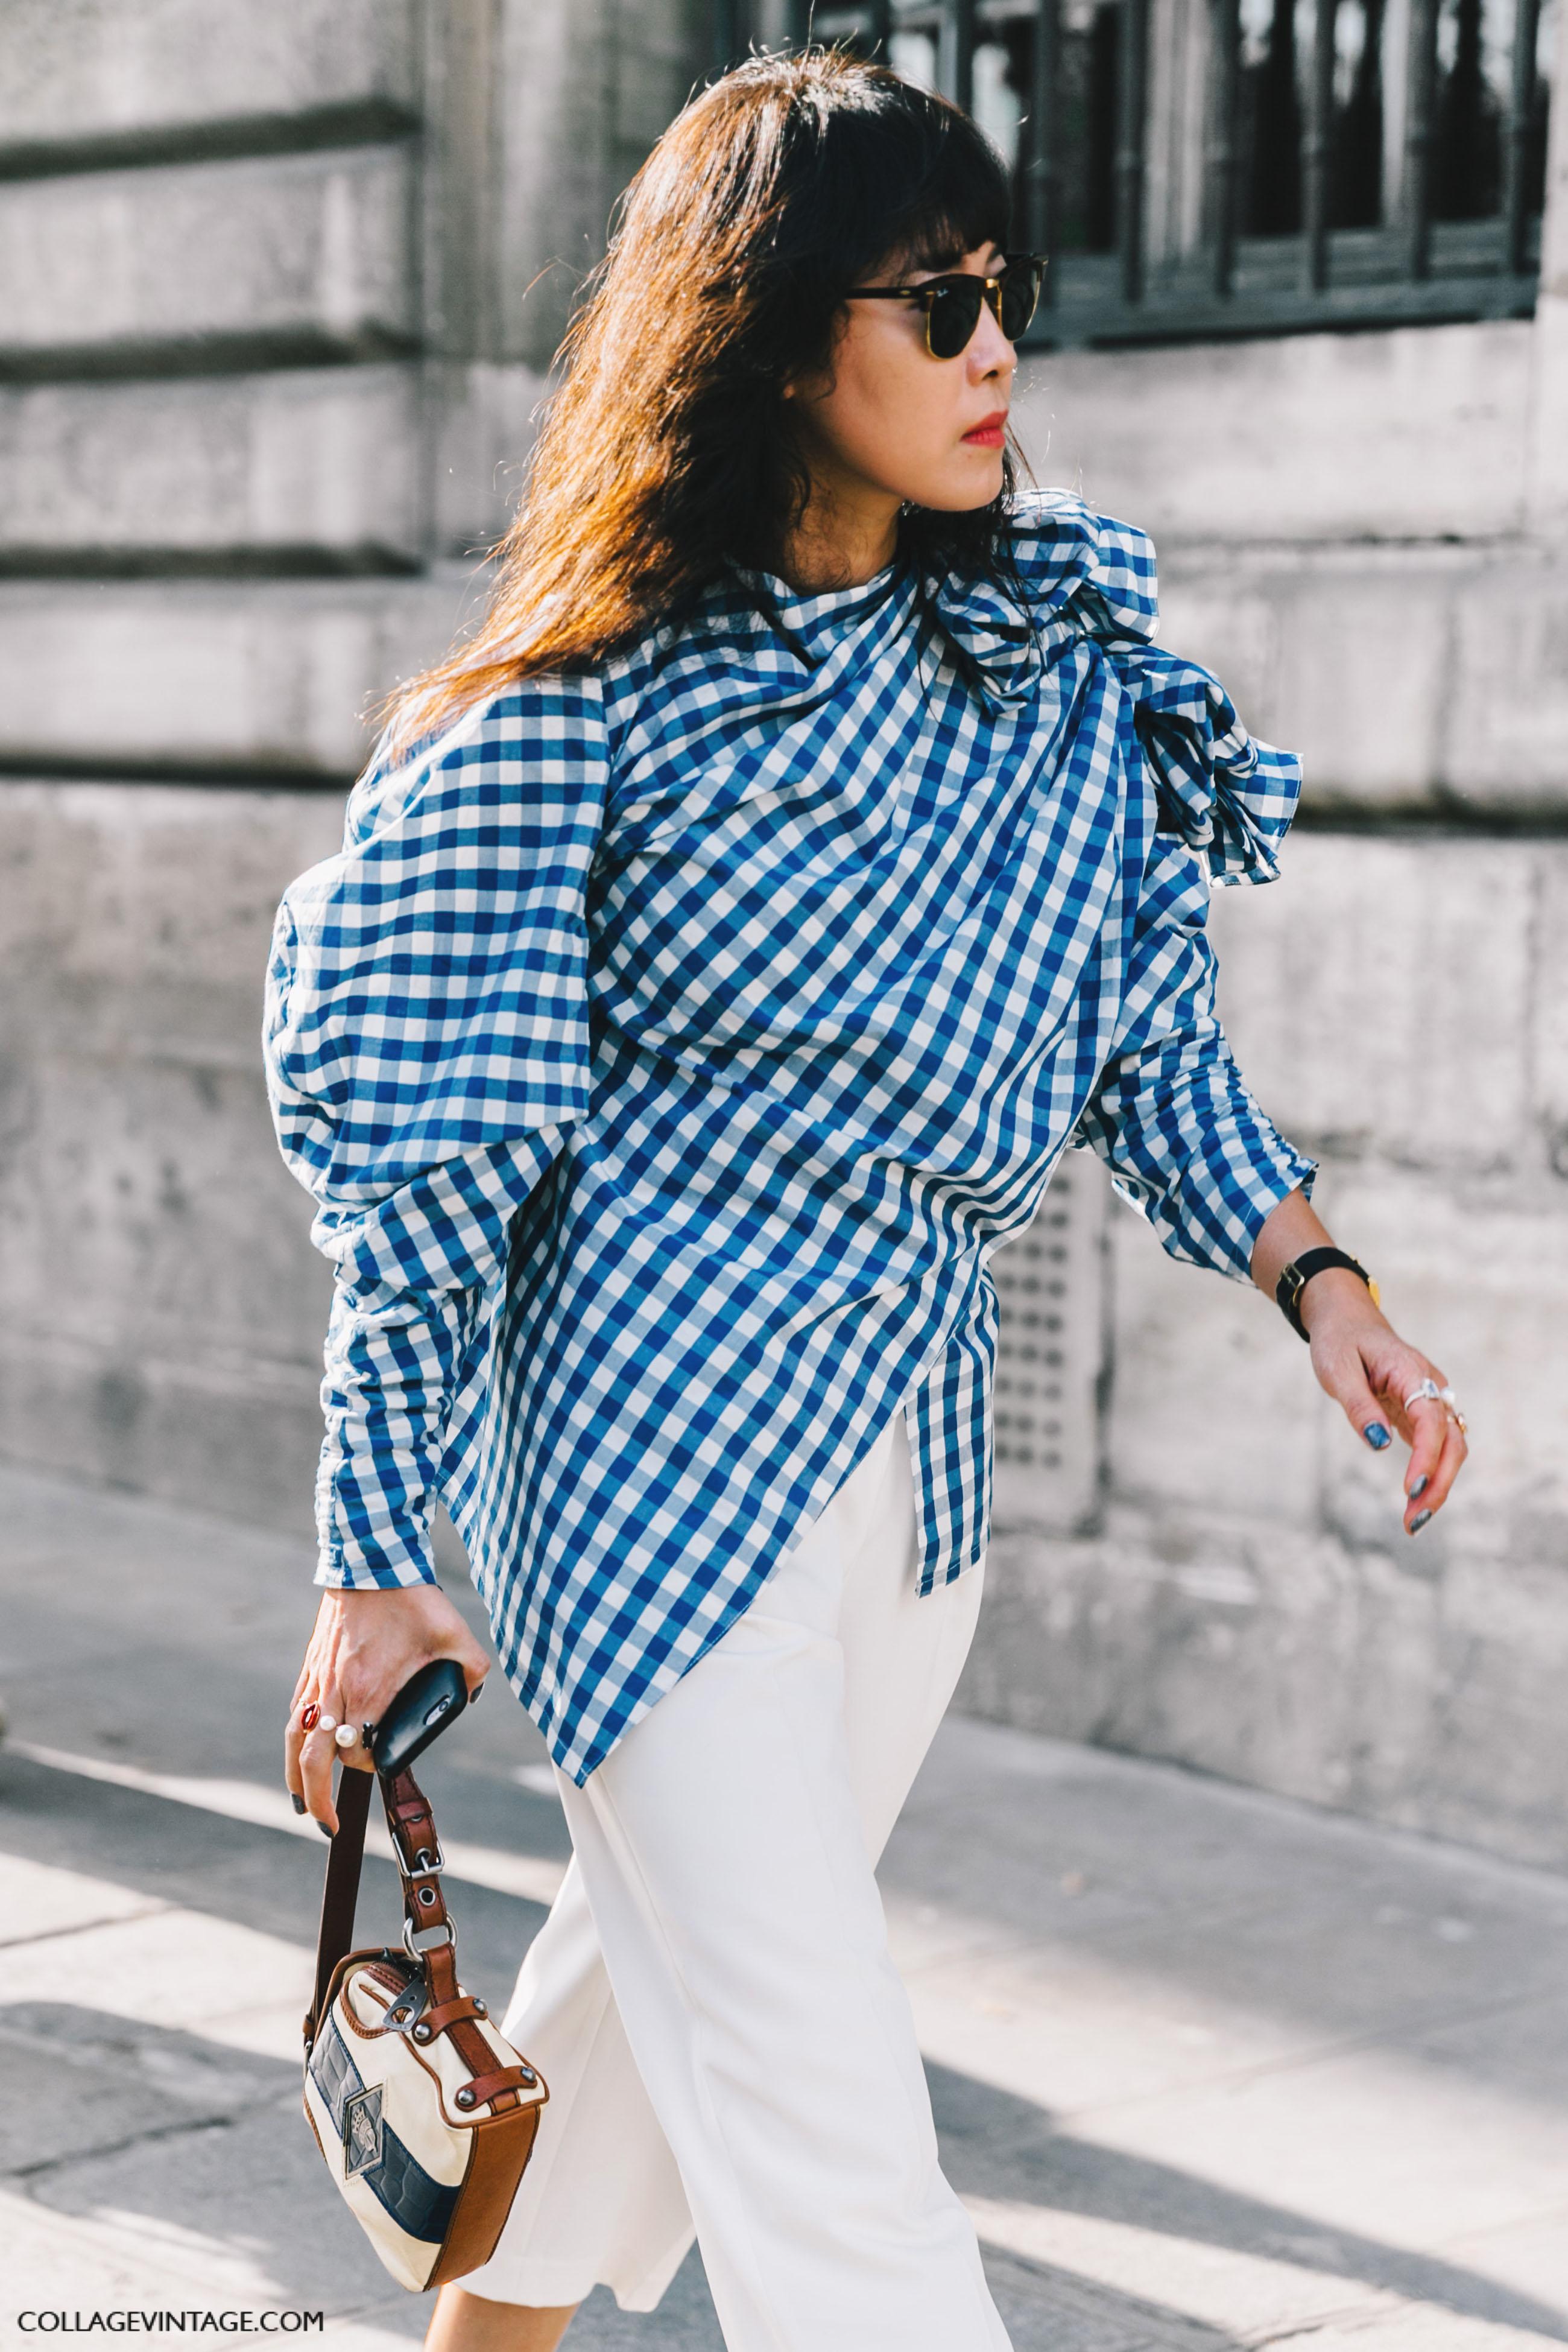 pfw-paris_fashion_week_ss17-street_style-outfits-collage_vintage-rochas-courreges-dries_van_noten-lanvin-guy_laroche-34